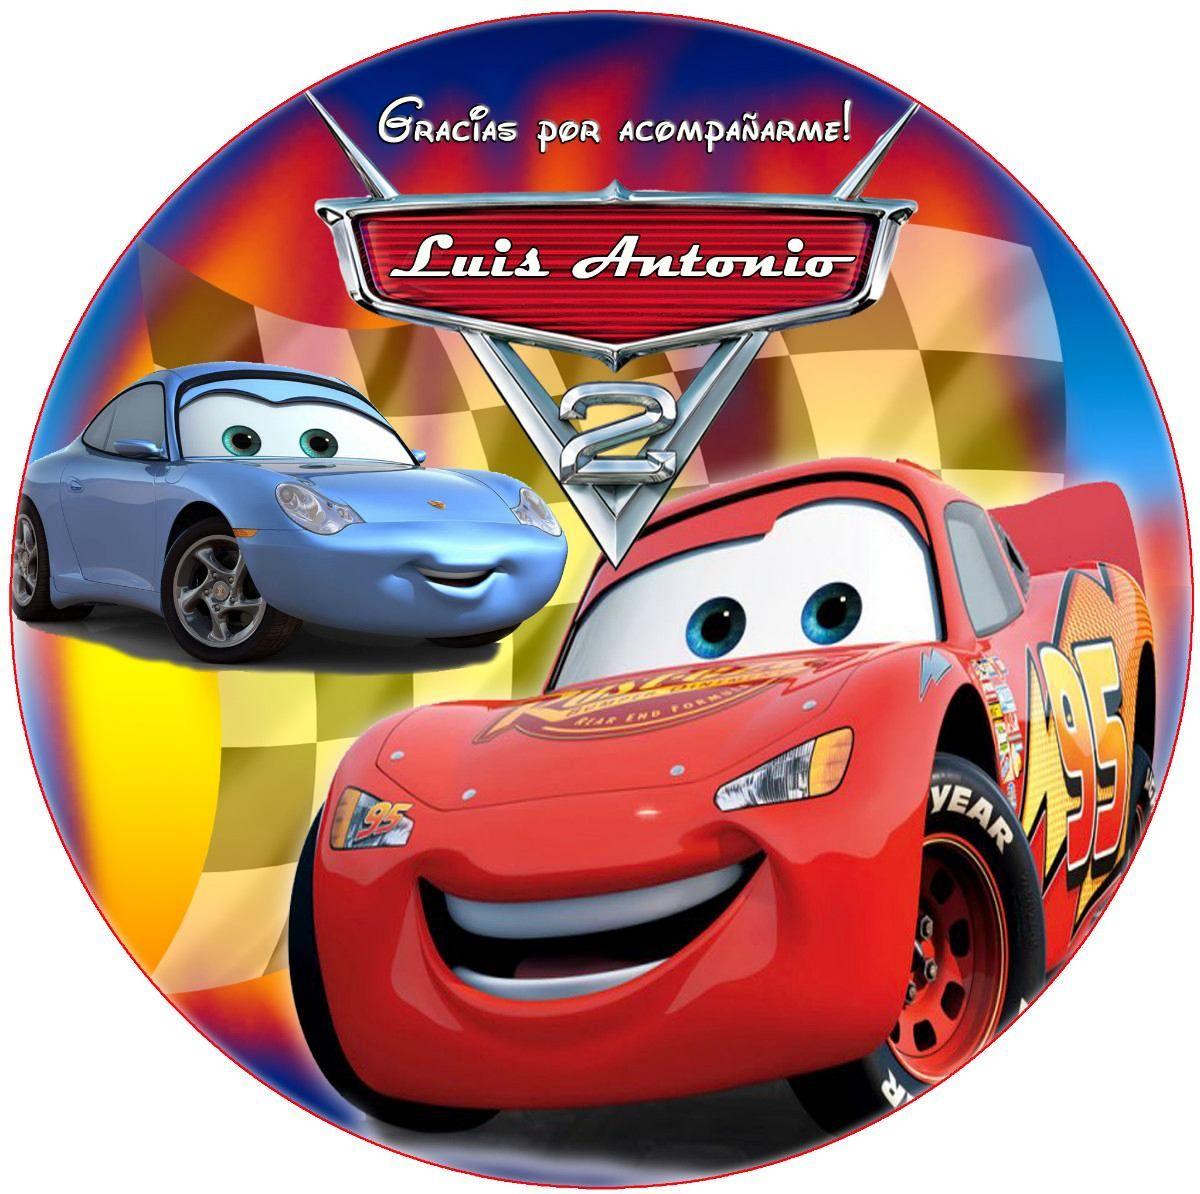 Tarjetitas De Recordatorio De Car Para Imprimir Gratis Ask Com Image Search Tarjetas De Cumpleanos Para Imprimir Tarjetas De Cars Tarjetas De Cumpleanos